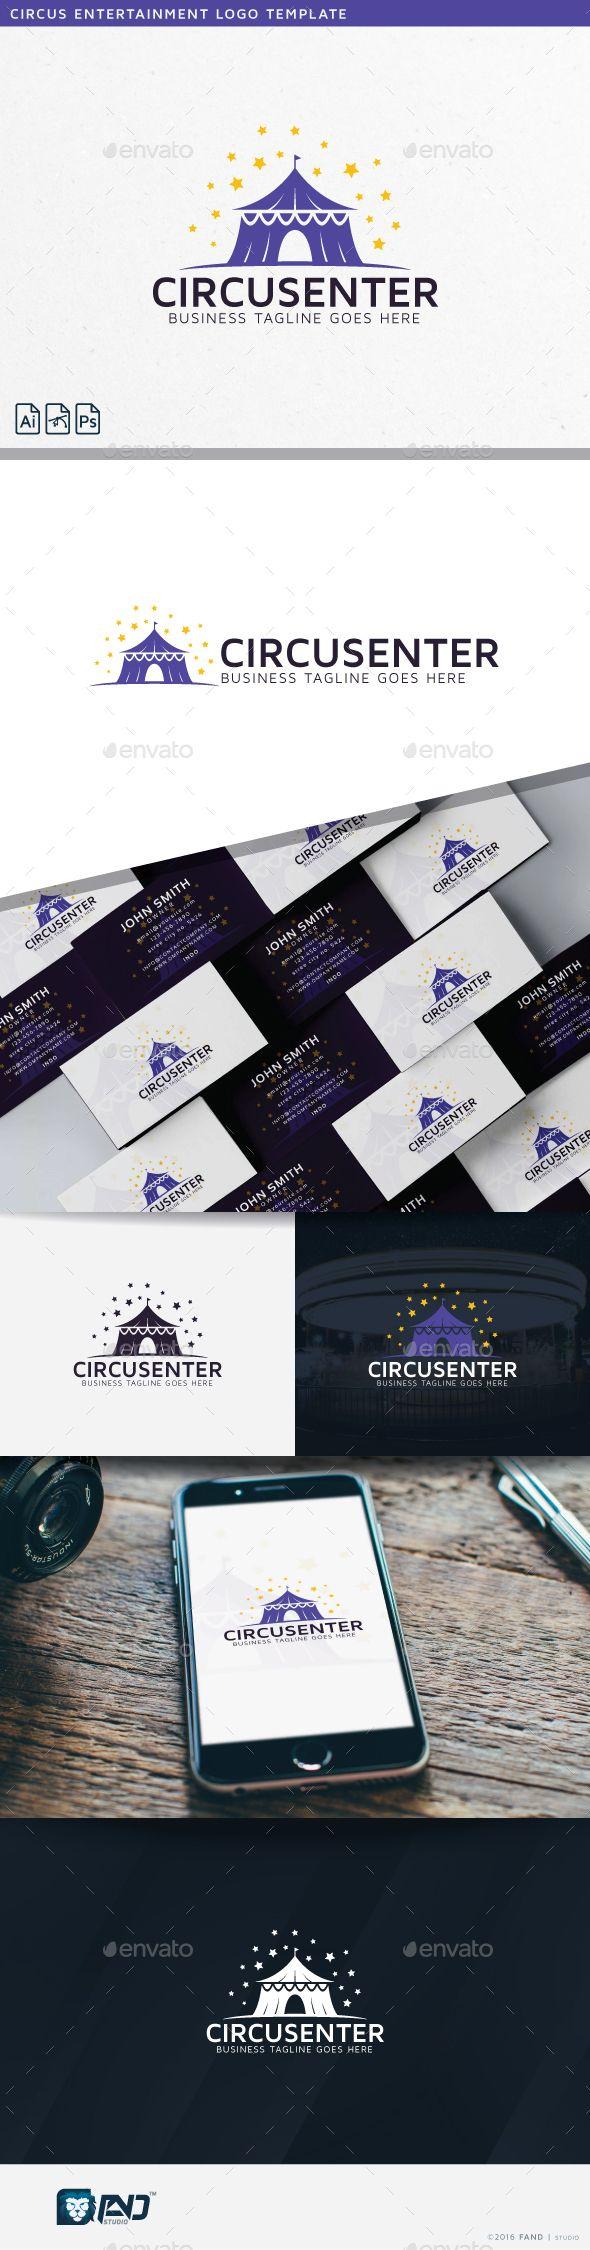 Circus Entertainment Logo Template #caravan #carnival #center #child #children #circus #clean #clown #creative #creativity #entertainment #fun #happy #imaginative #industry #international #magic #marquee #night #professional #purple #show #sky #spectacle #stars #studio #tent #unique #vector #yellow